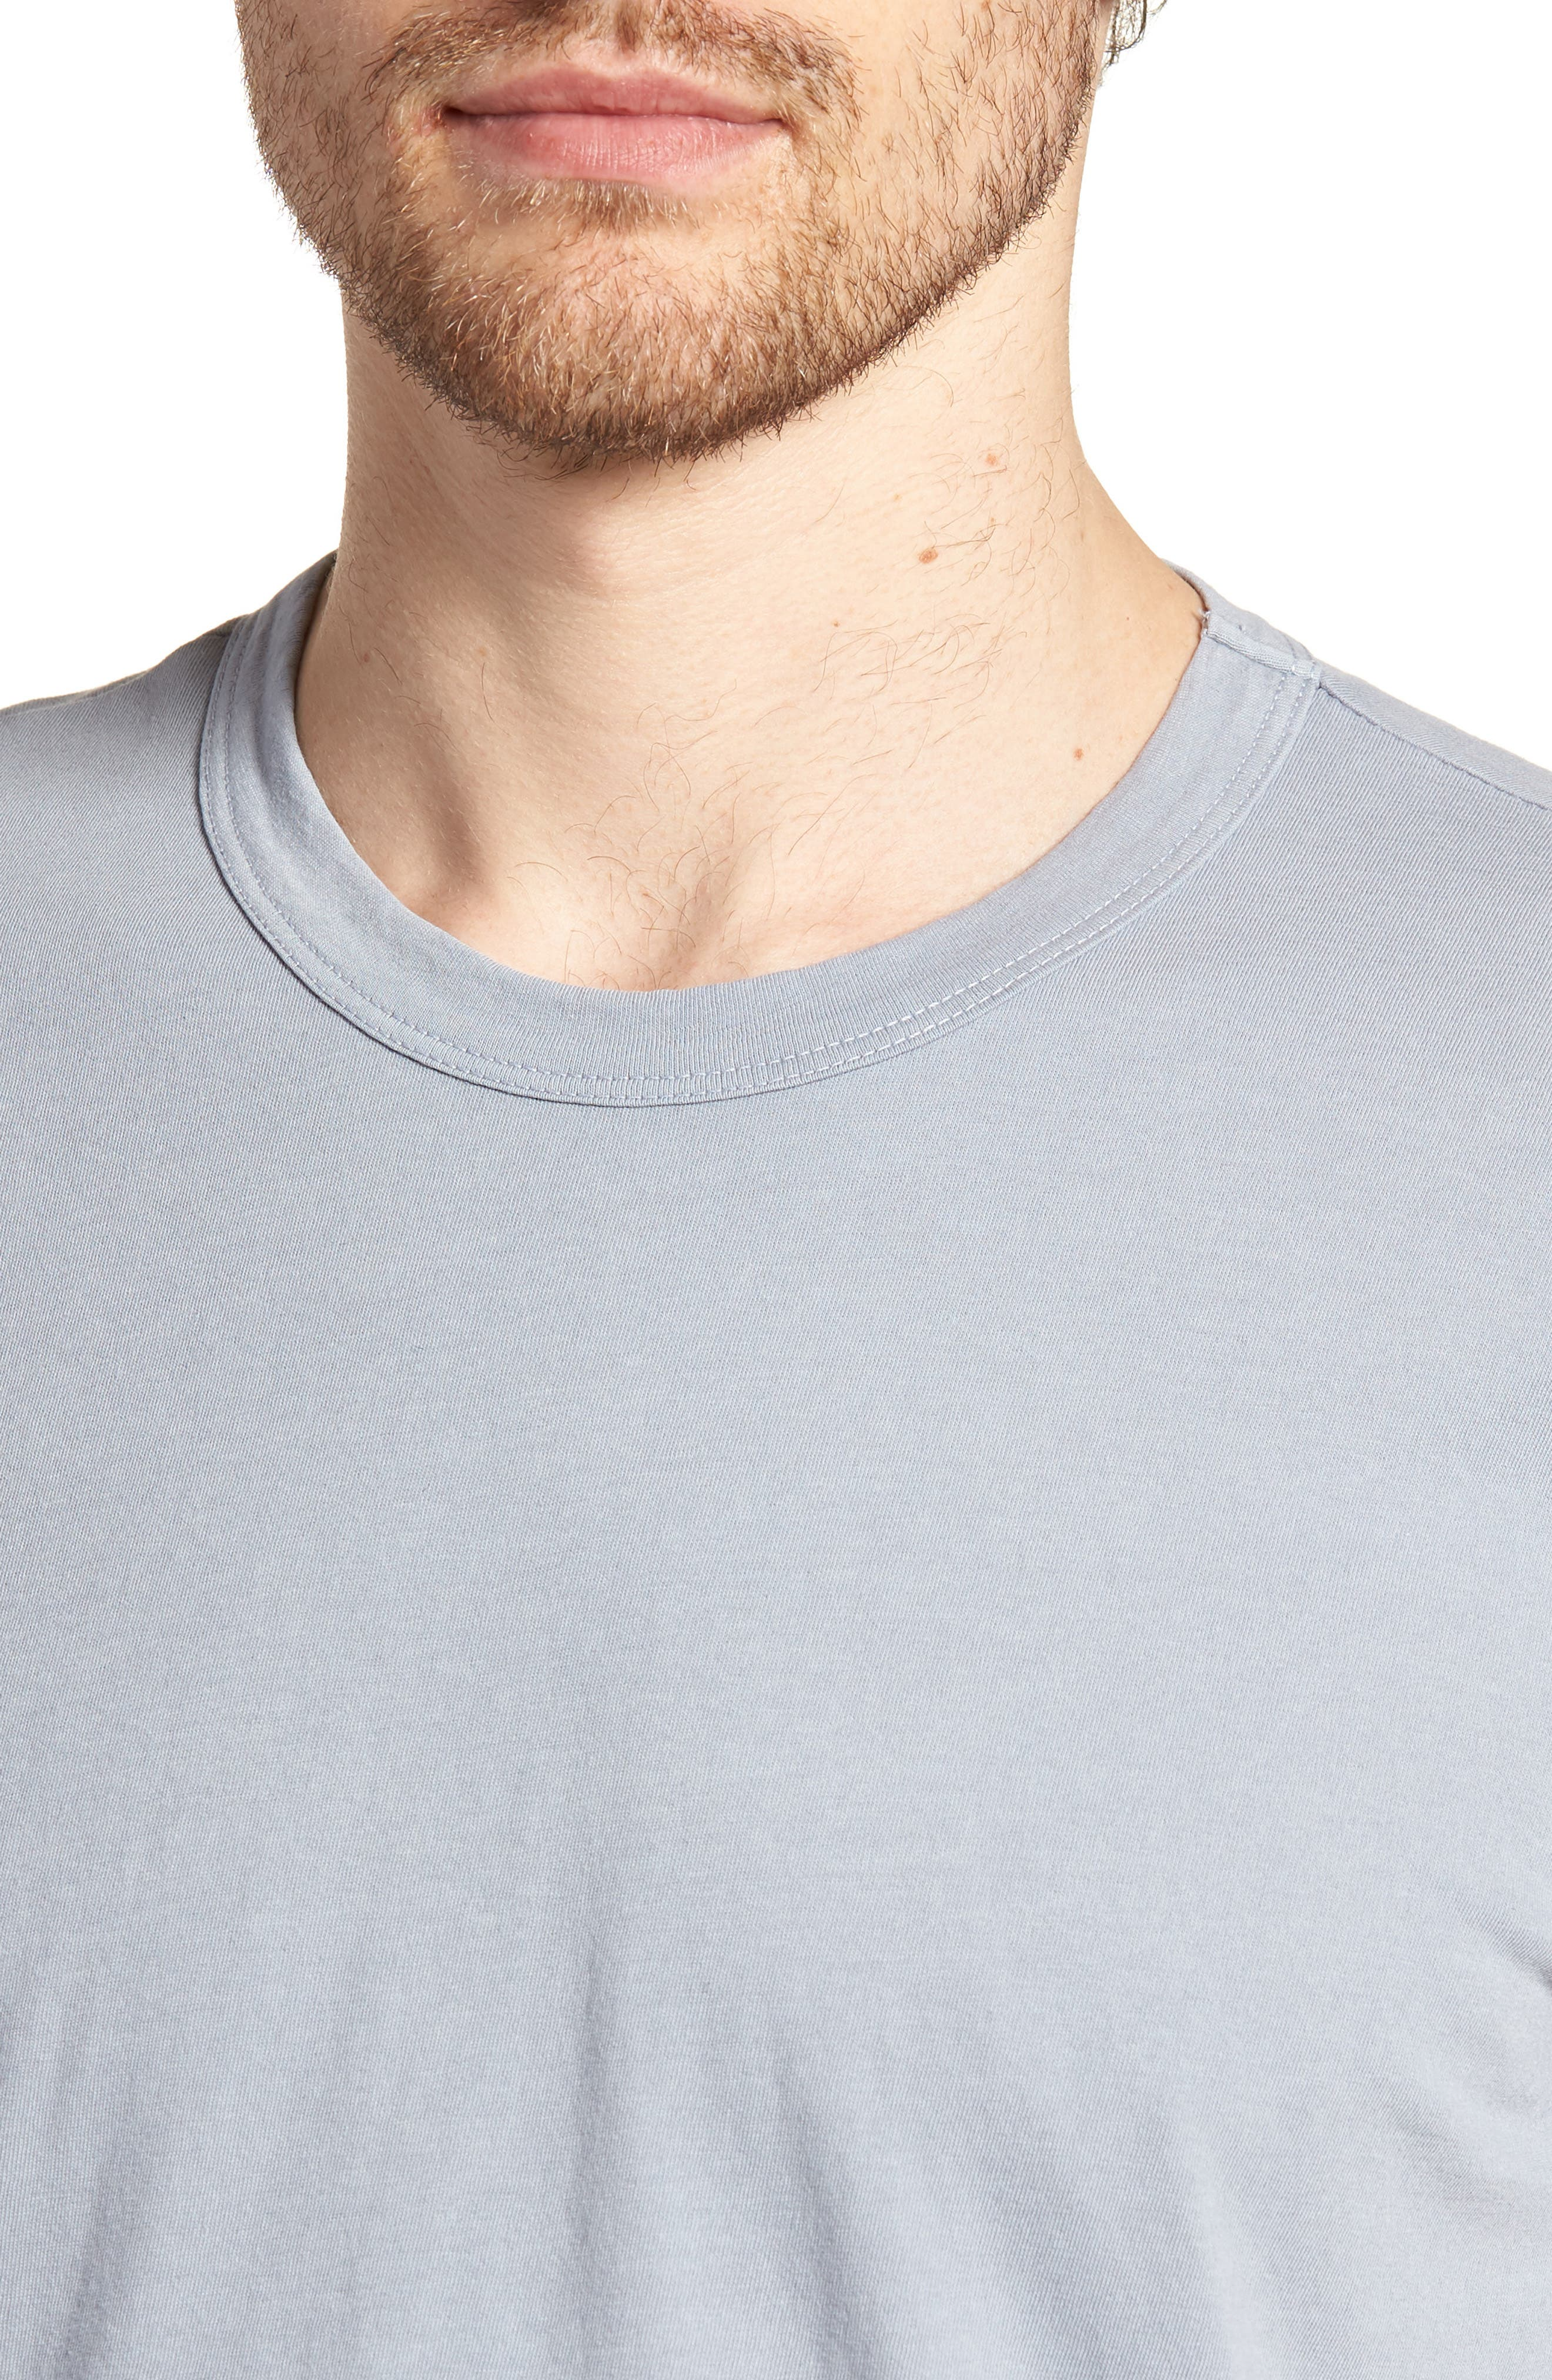 Checkerboard Crewneck T-Shirt,                             Alternate thumbnail 4, color,                             053